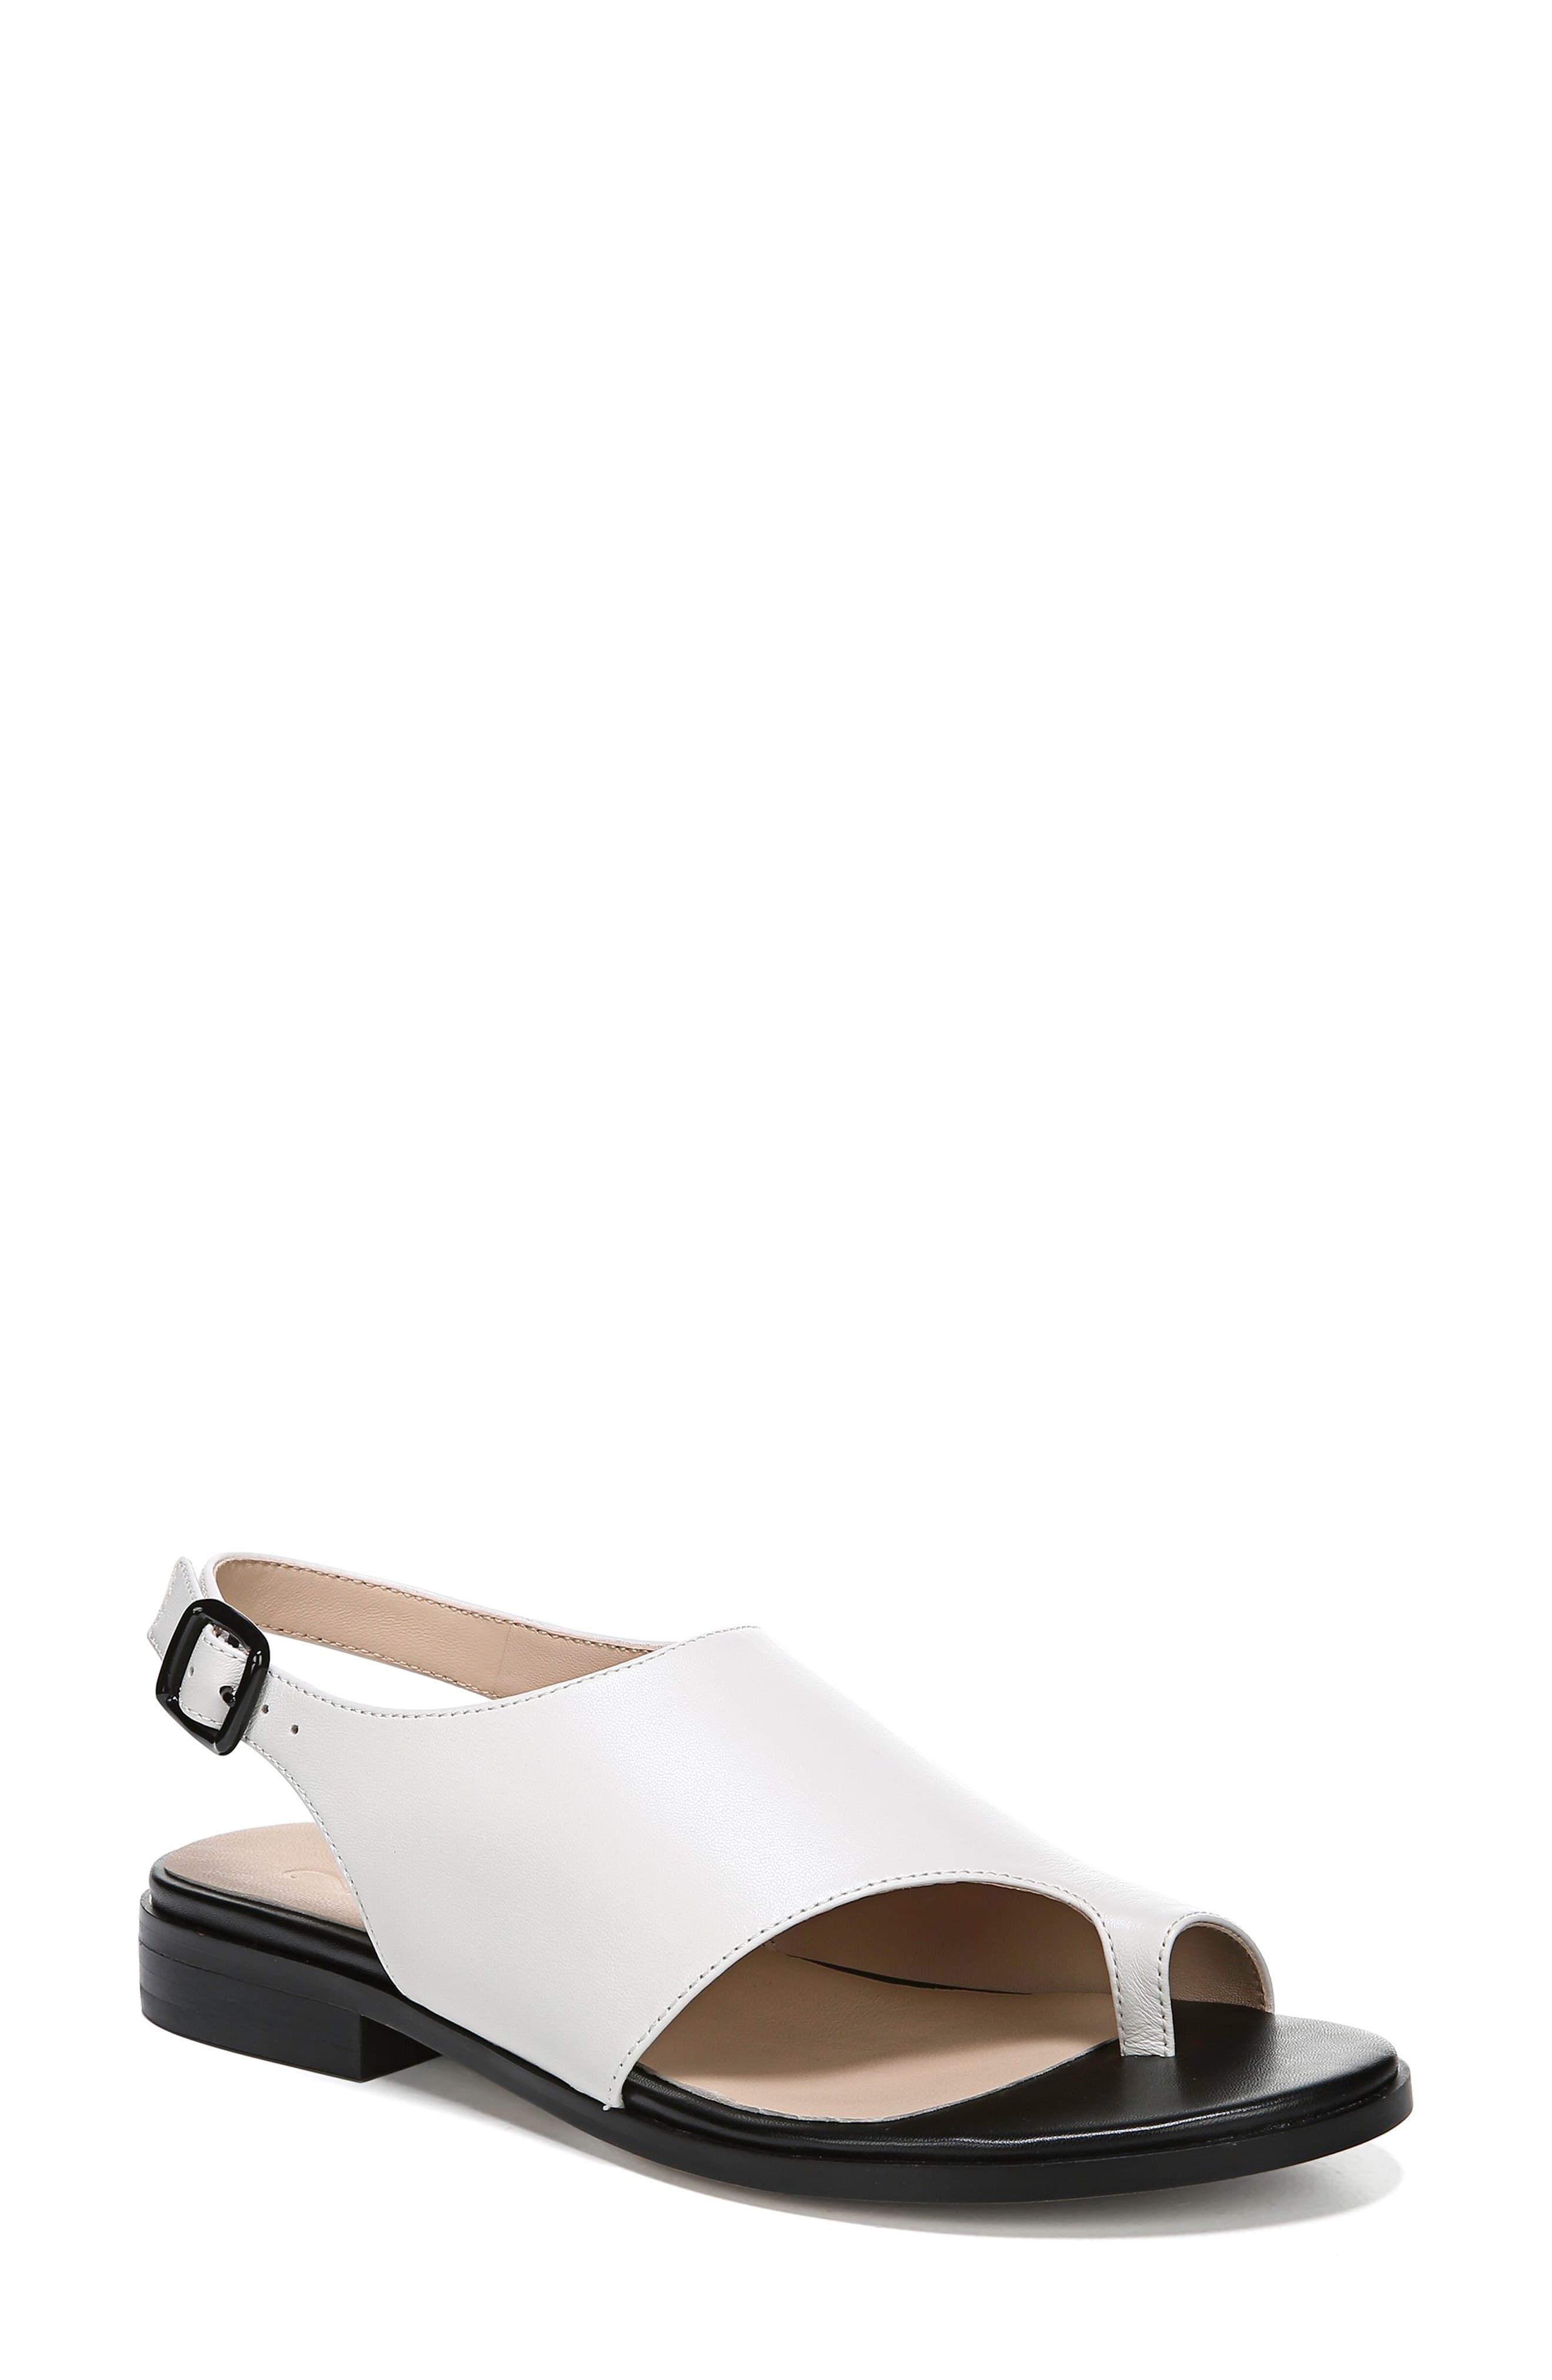 Women's 27 Edit Emma Toe Loop Sandal, Size 7.5 M Black